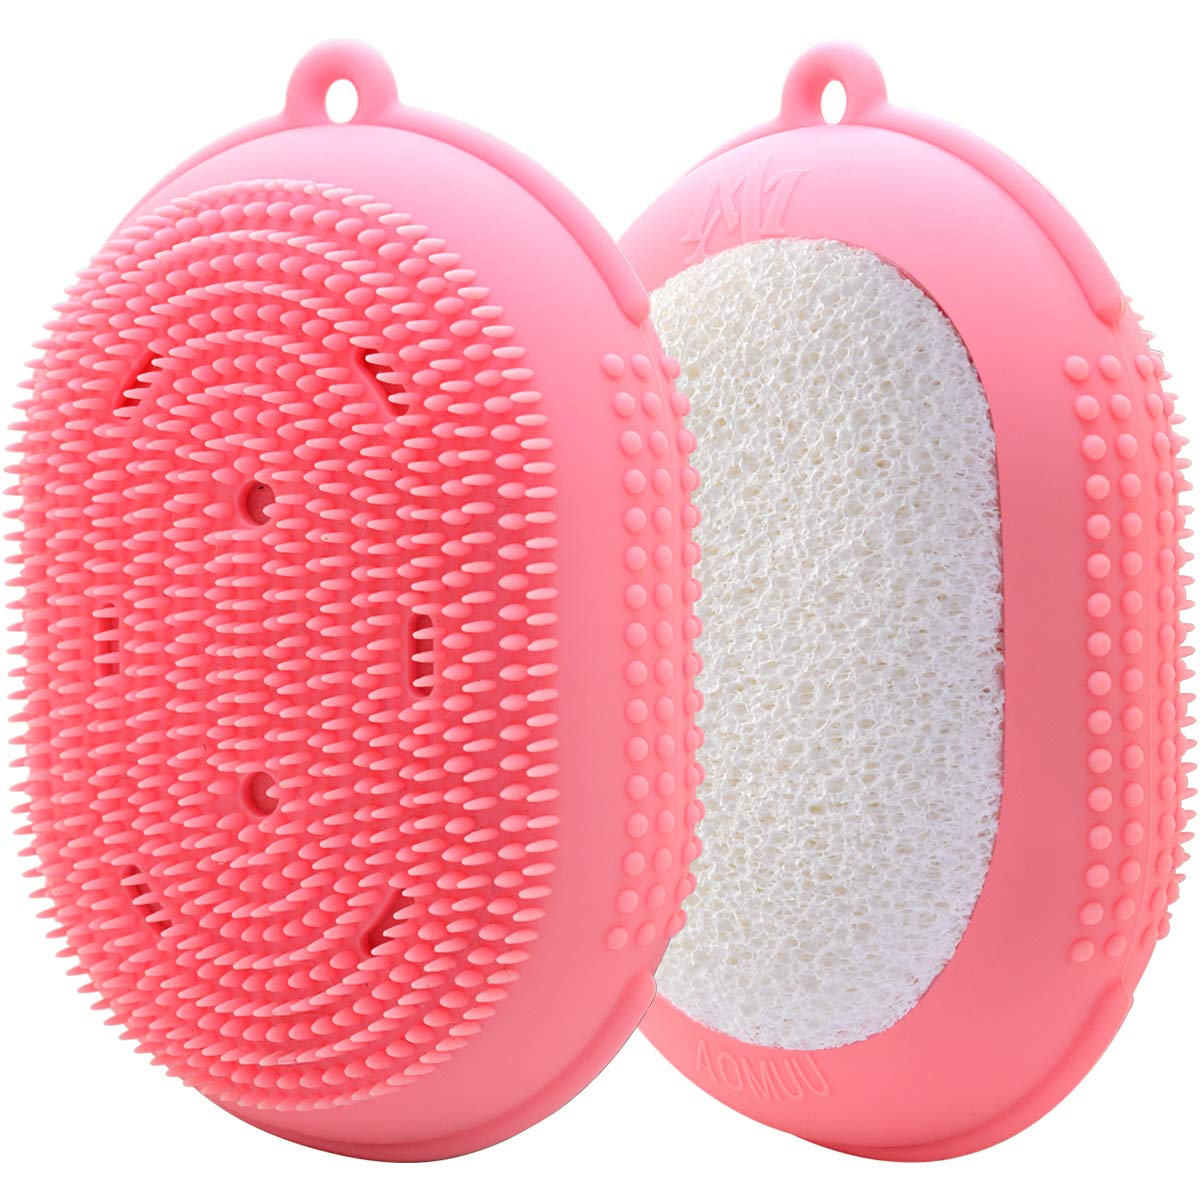 Silicone Body Scrubber Bath Sponge - AOMUU 2 in 1 Exfoliating Body Brush Loofah Shower Sponge for Women Men kids